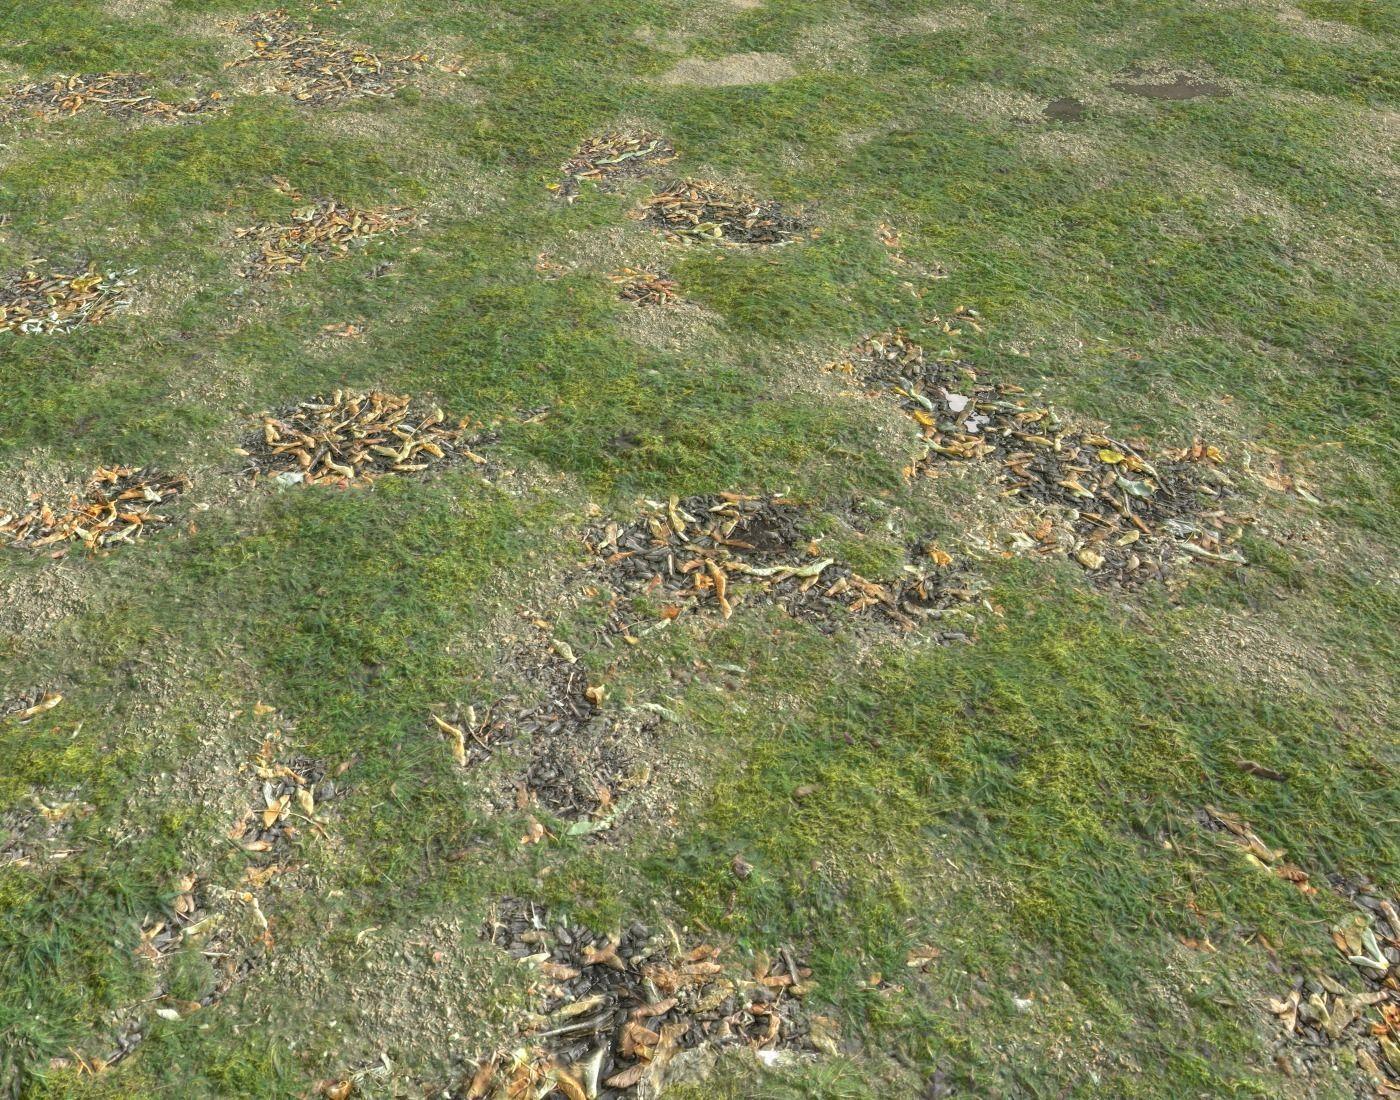 Grassy ground PBR